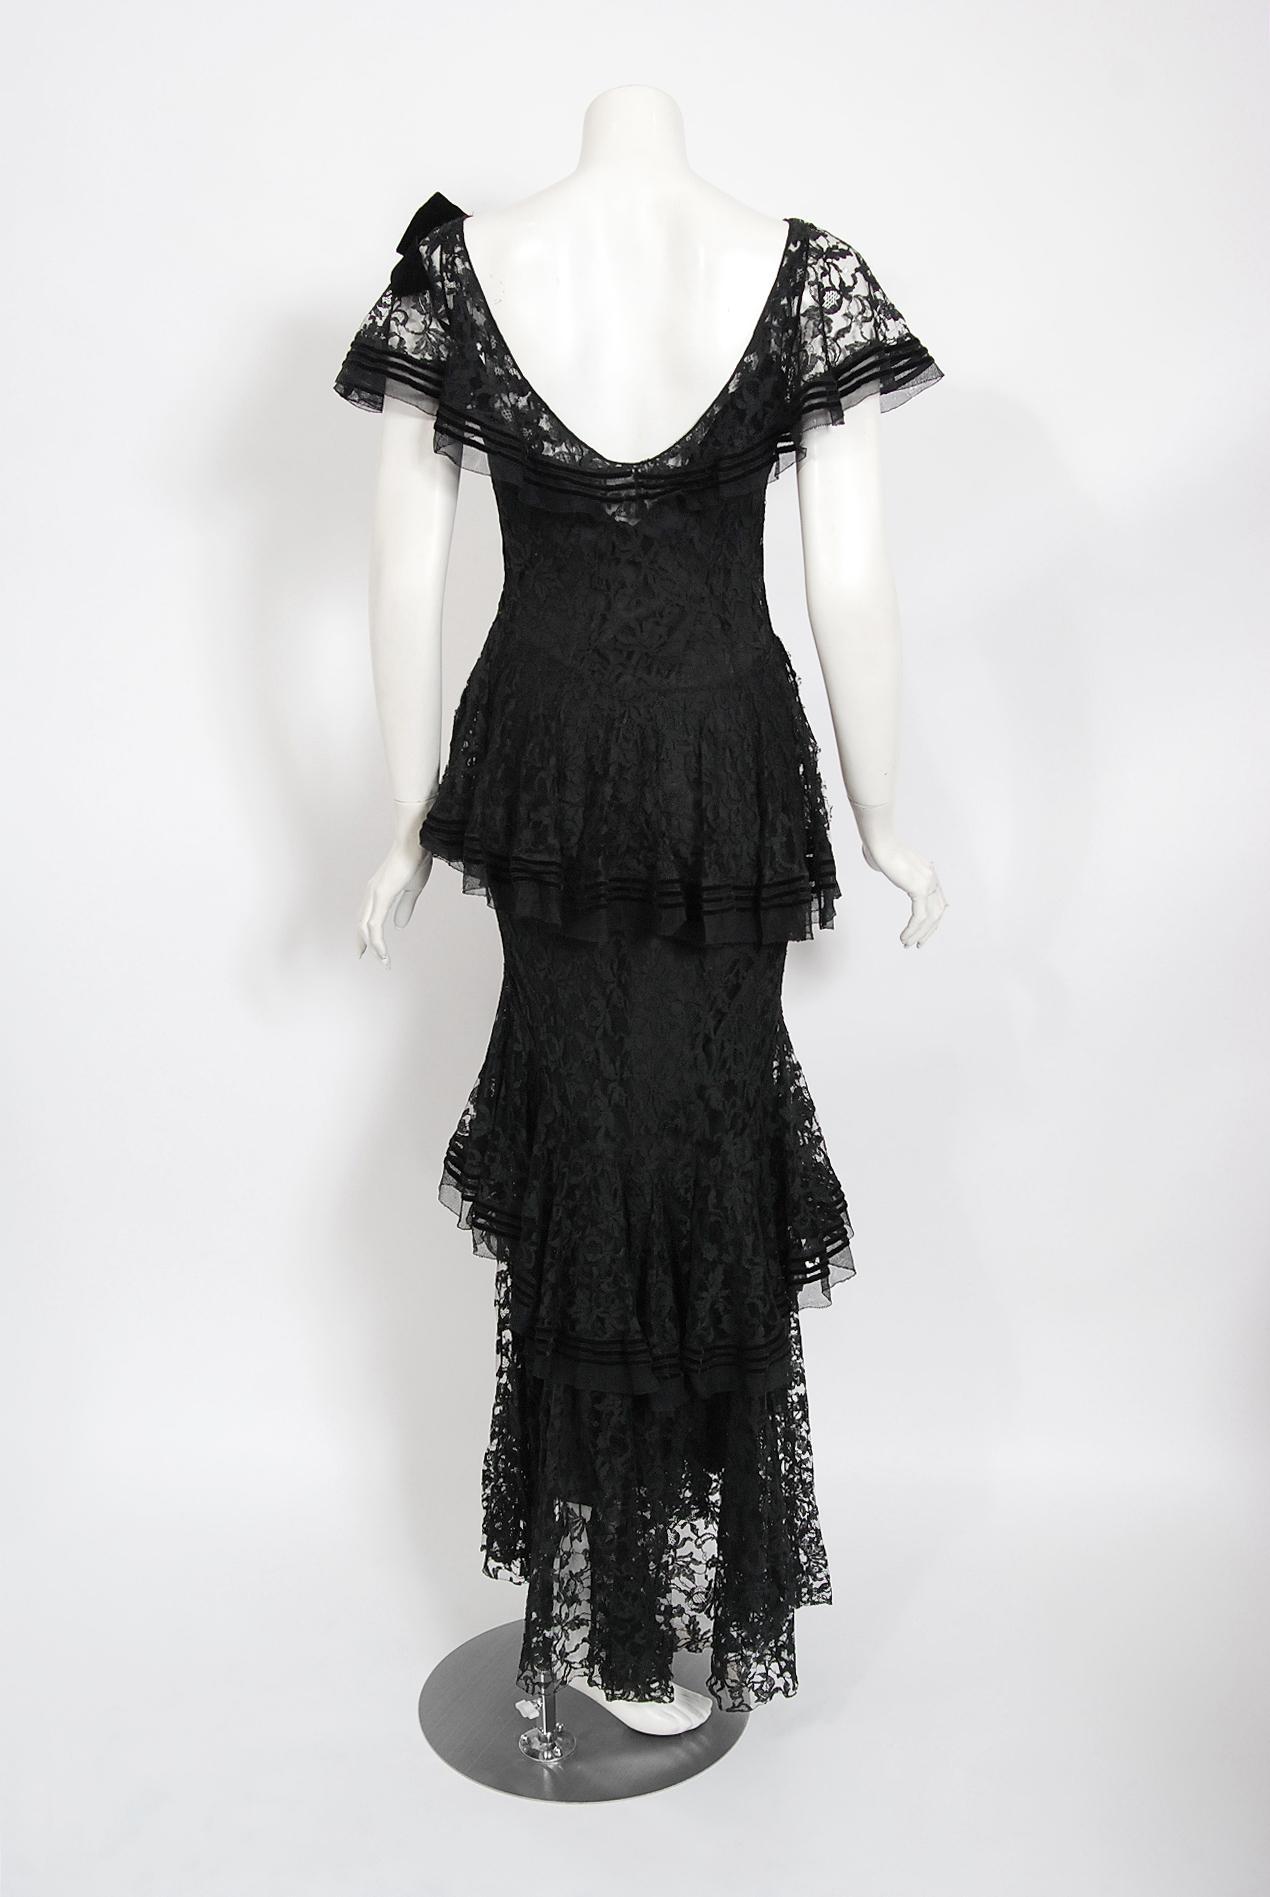 beaded bias cut dress 1990s black draped backless bias cut dress medium large 90s does 1920s vintage clothing women